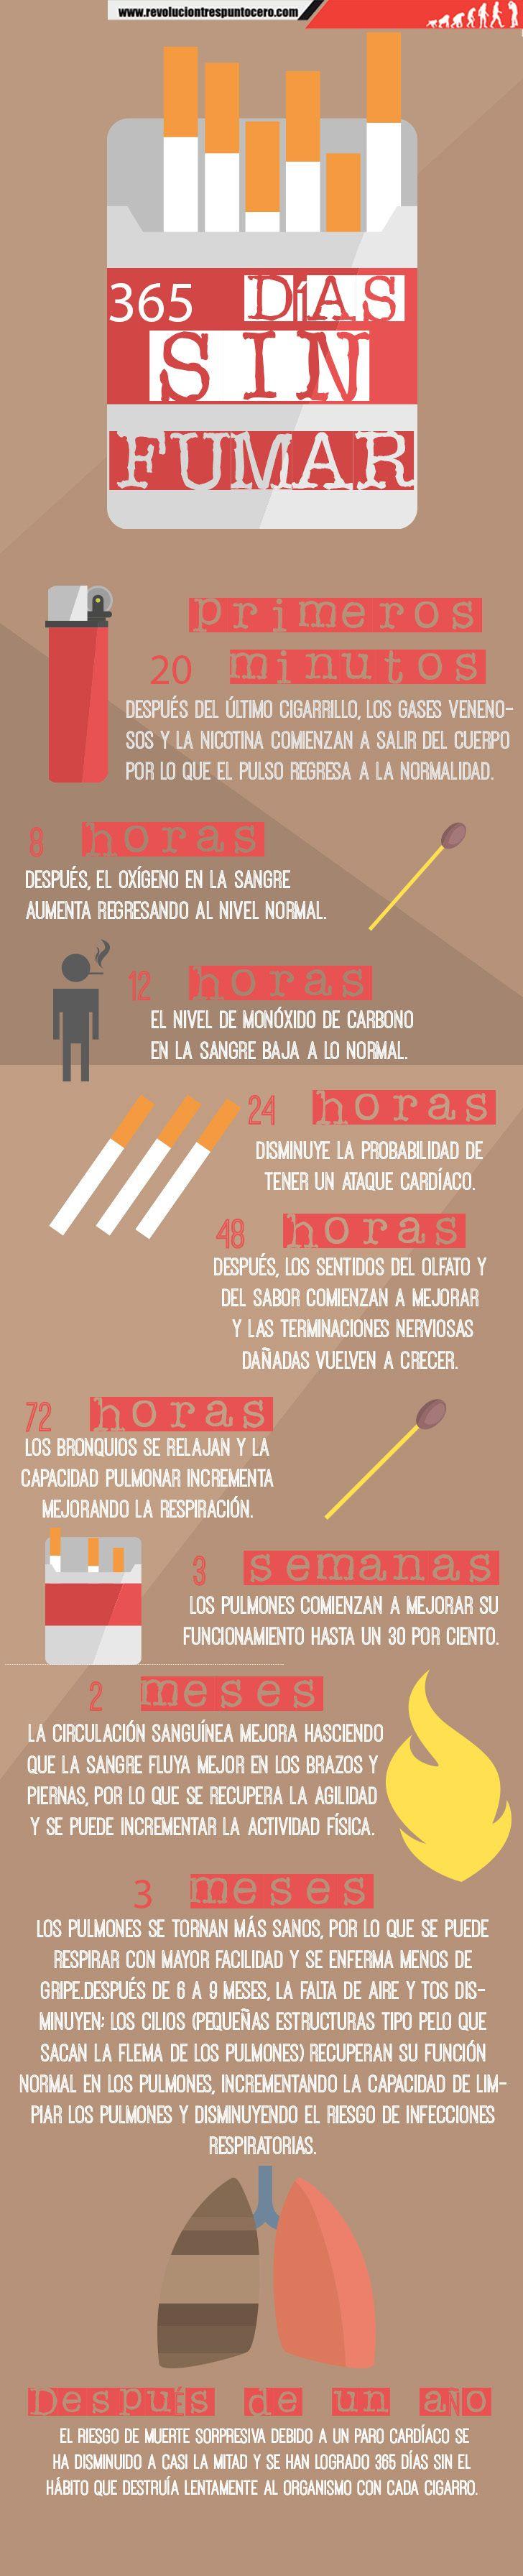 365 días sin fumar (INFOGRAFÍA) | Revolución Tres Punto Cero. http://www.farmaciafrancesa.com/main.asp?Familia=189&Subfamilia=498&cerca=familia&pag=1&p=211